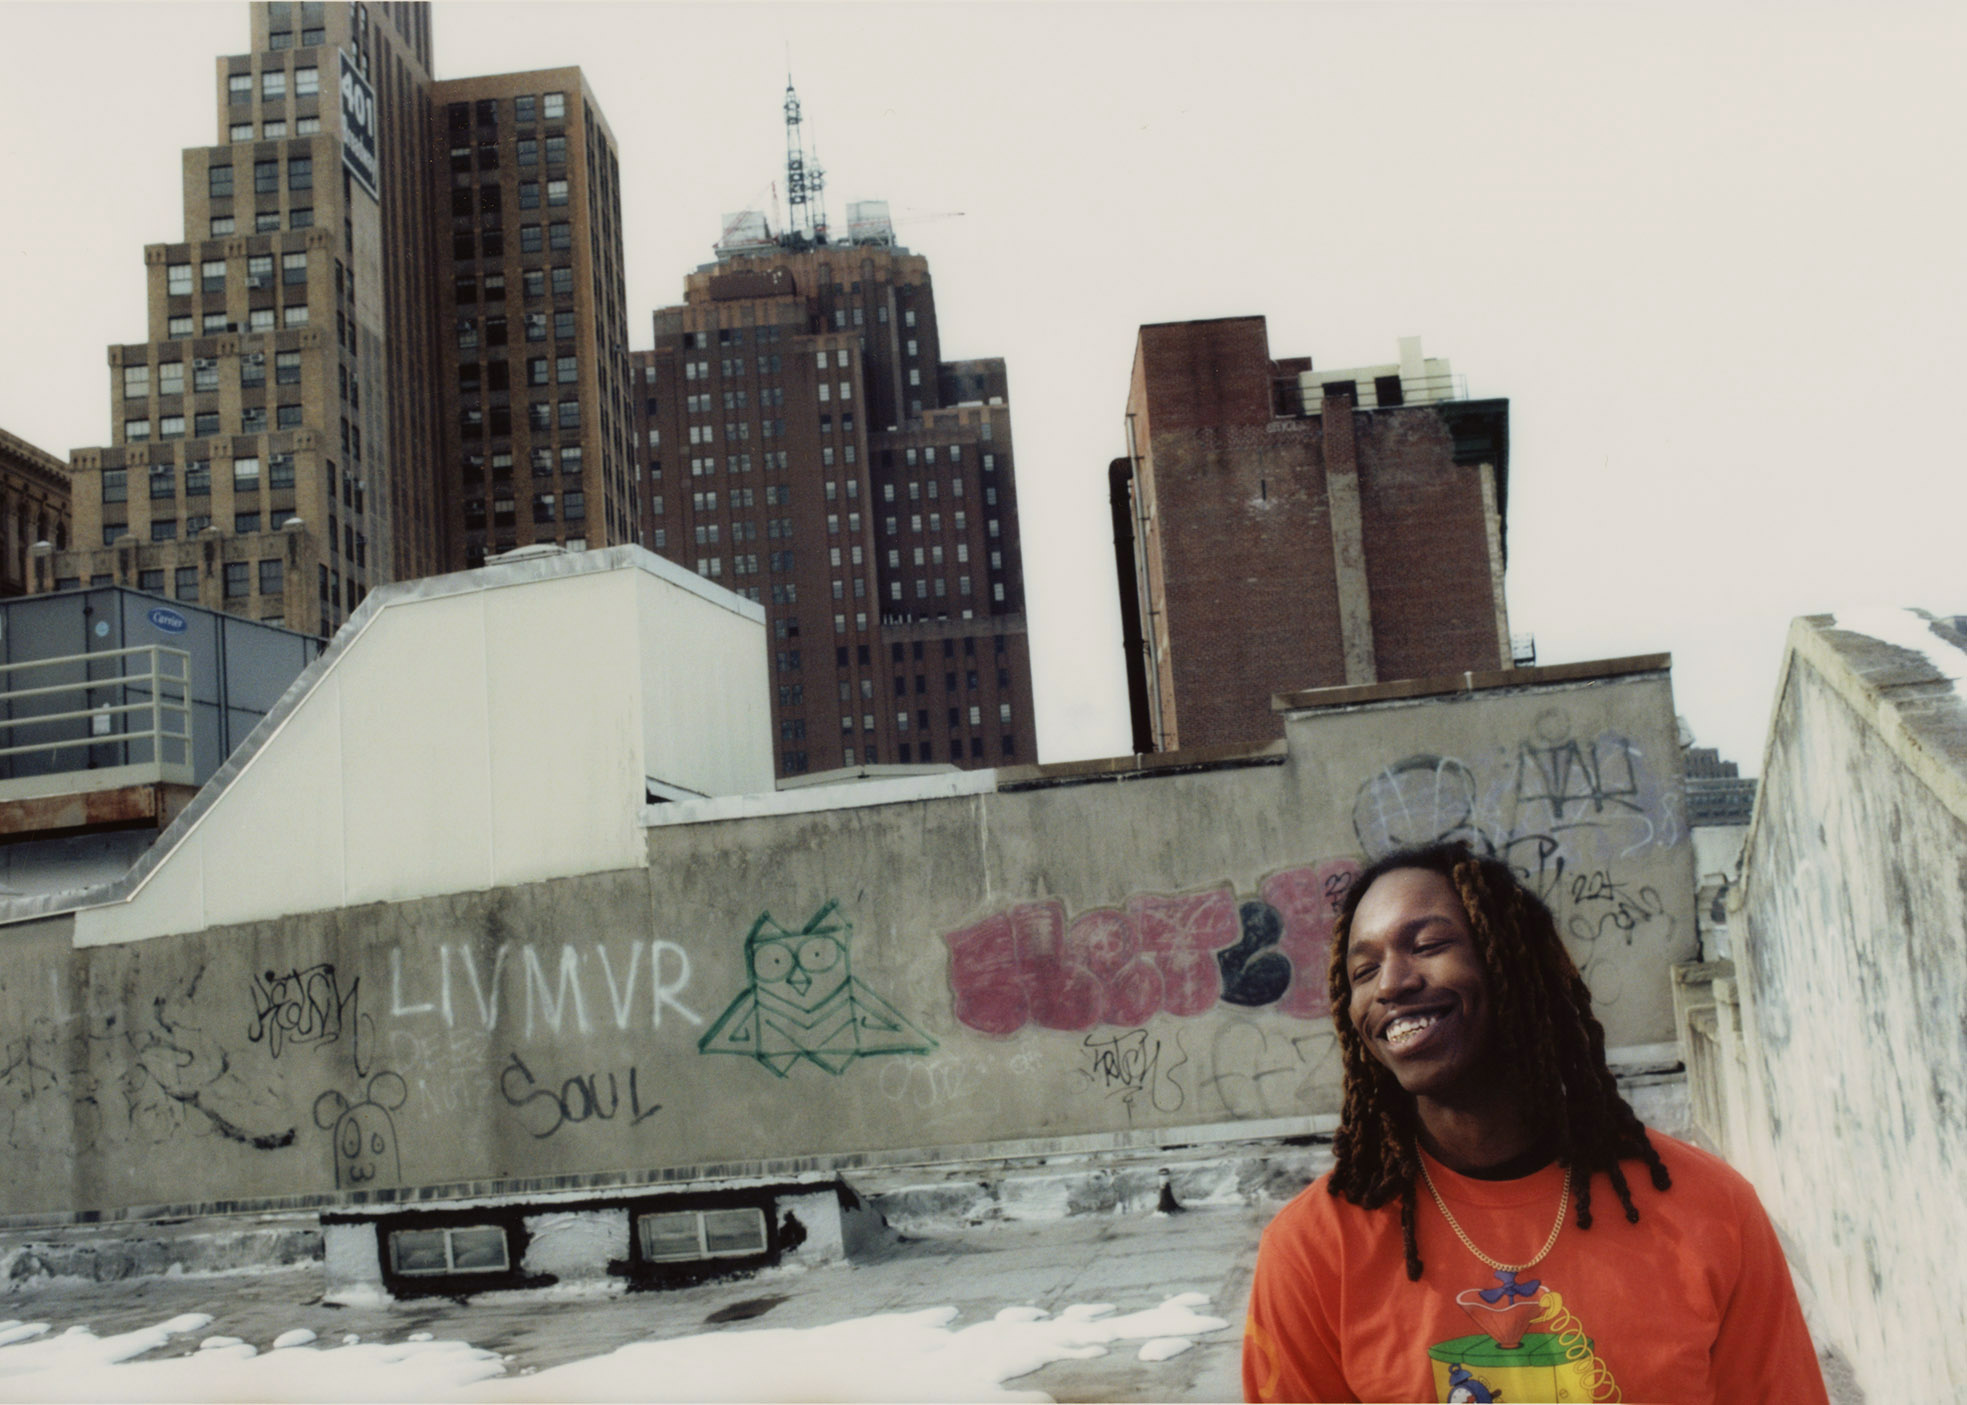 Mavi is the latest rising star in New York's lo-fi hip hop renaissance